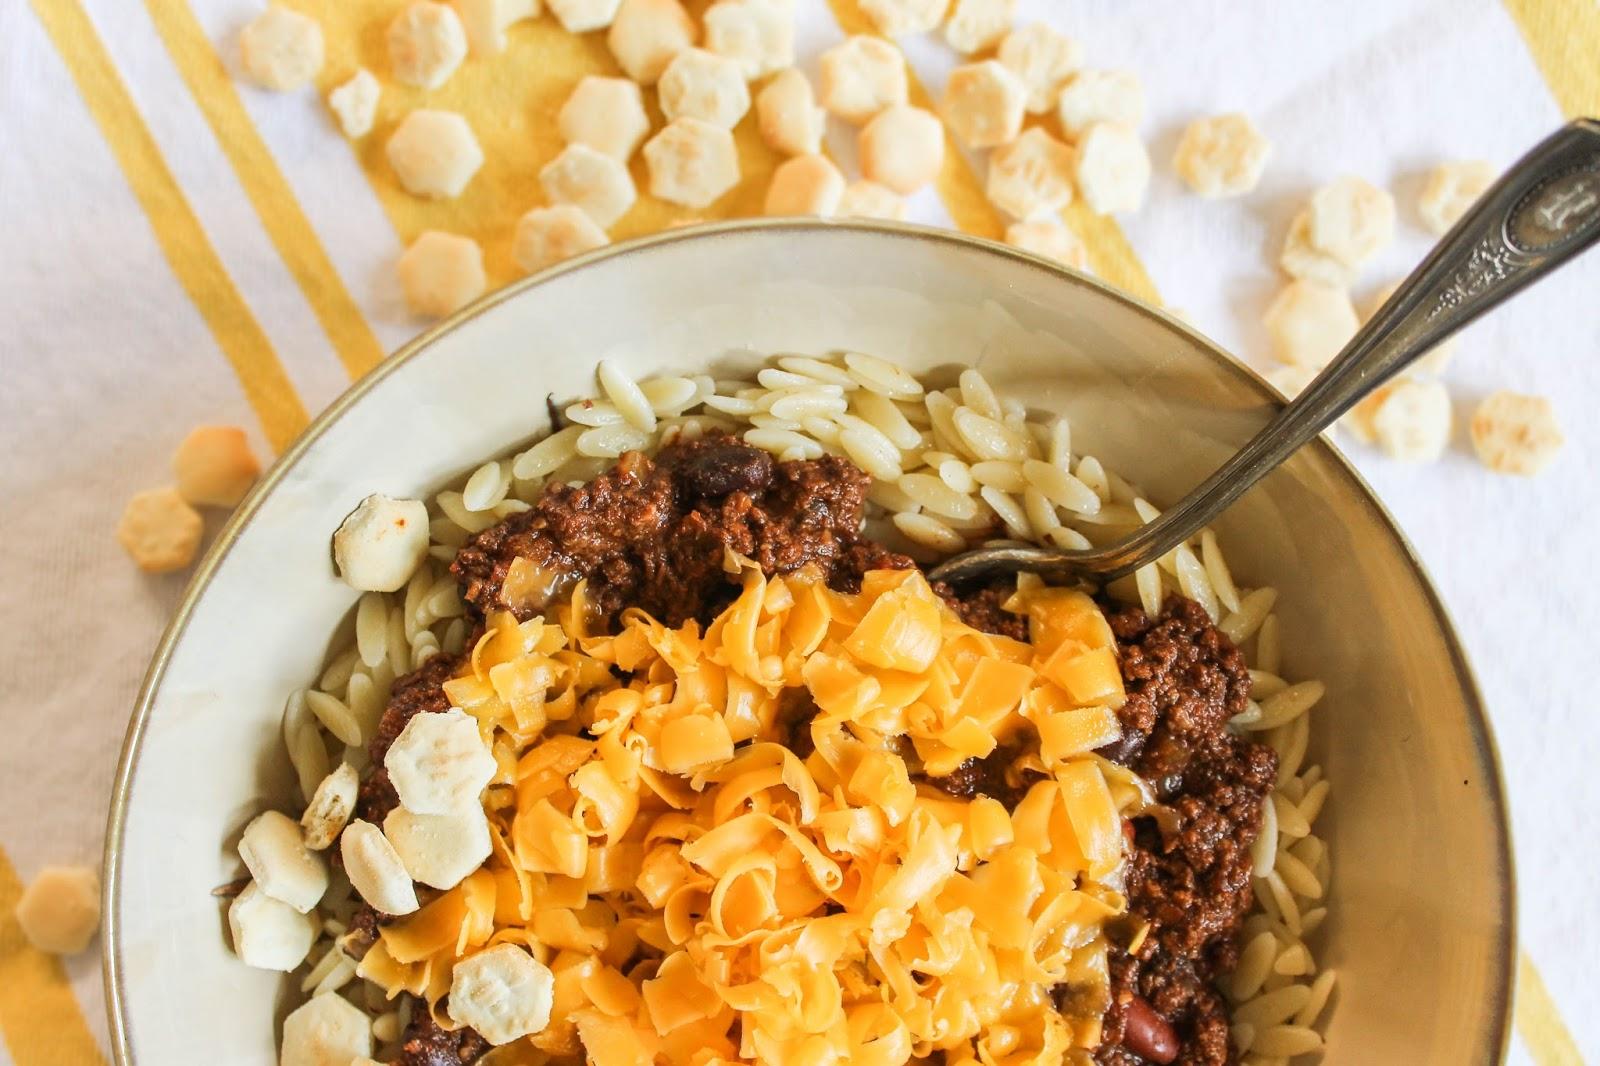 Recipe adapted from Dax Phillip's Cincinnati Chili